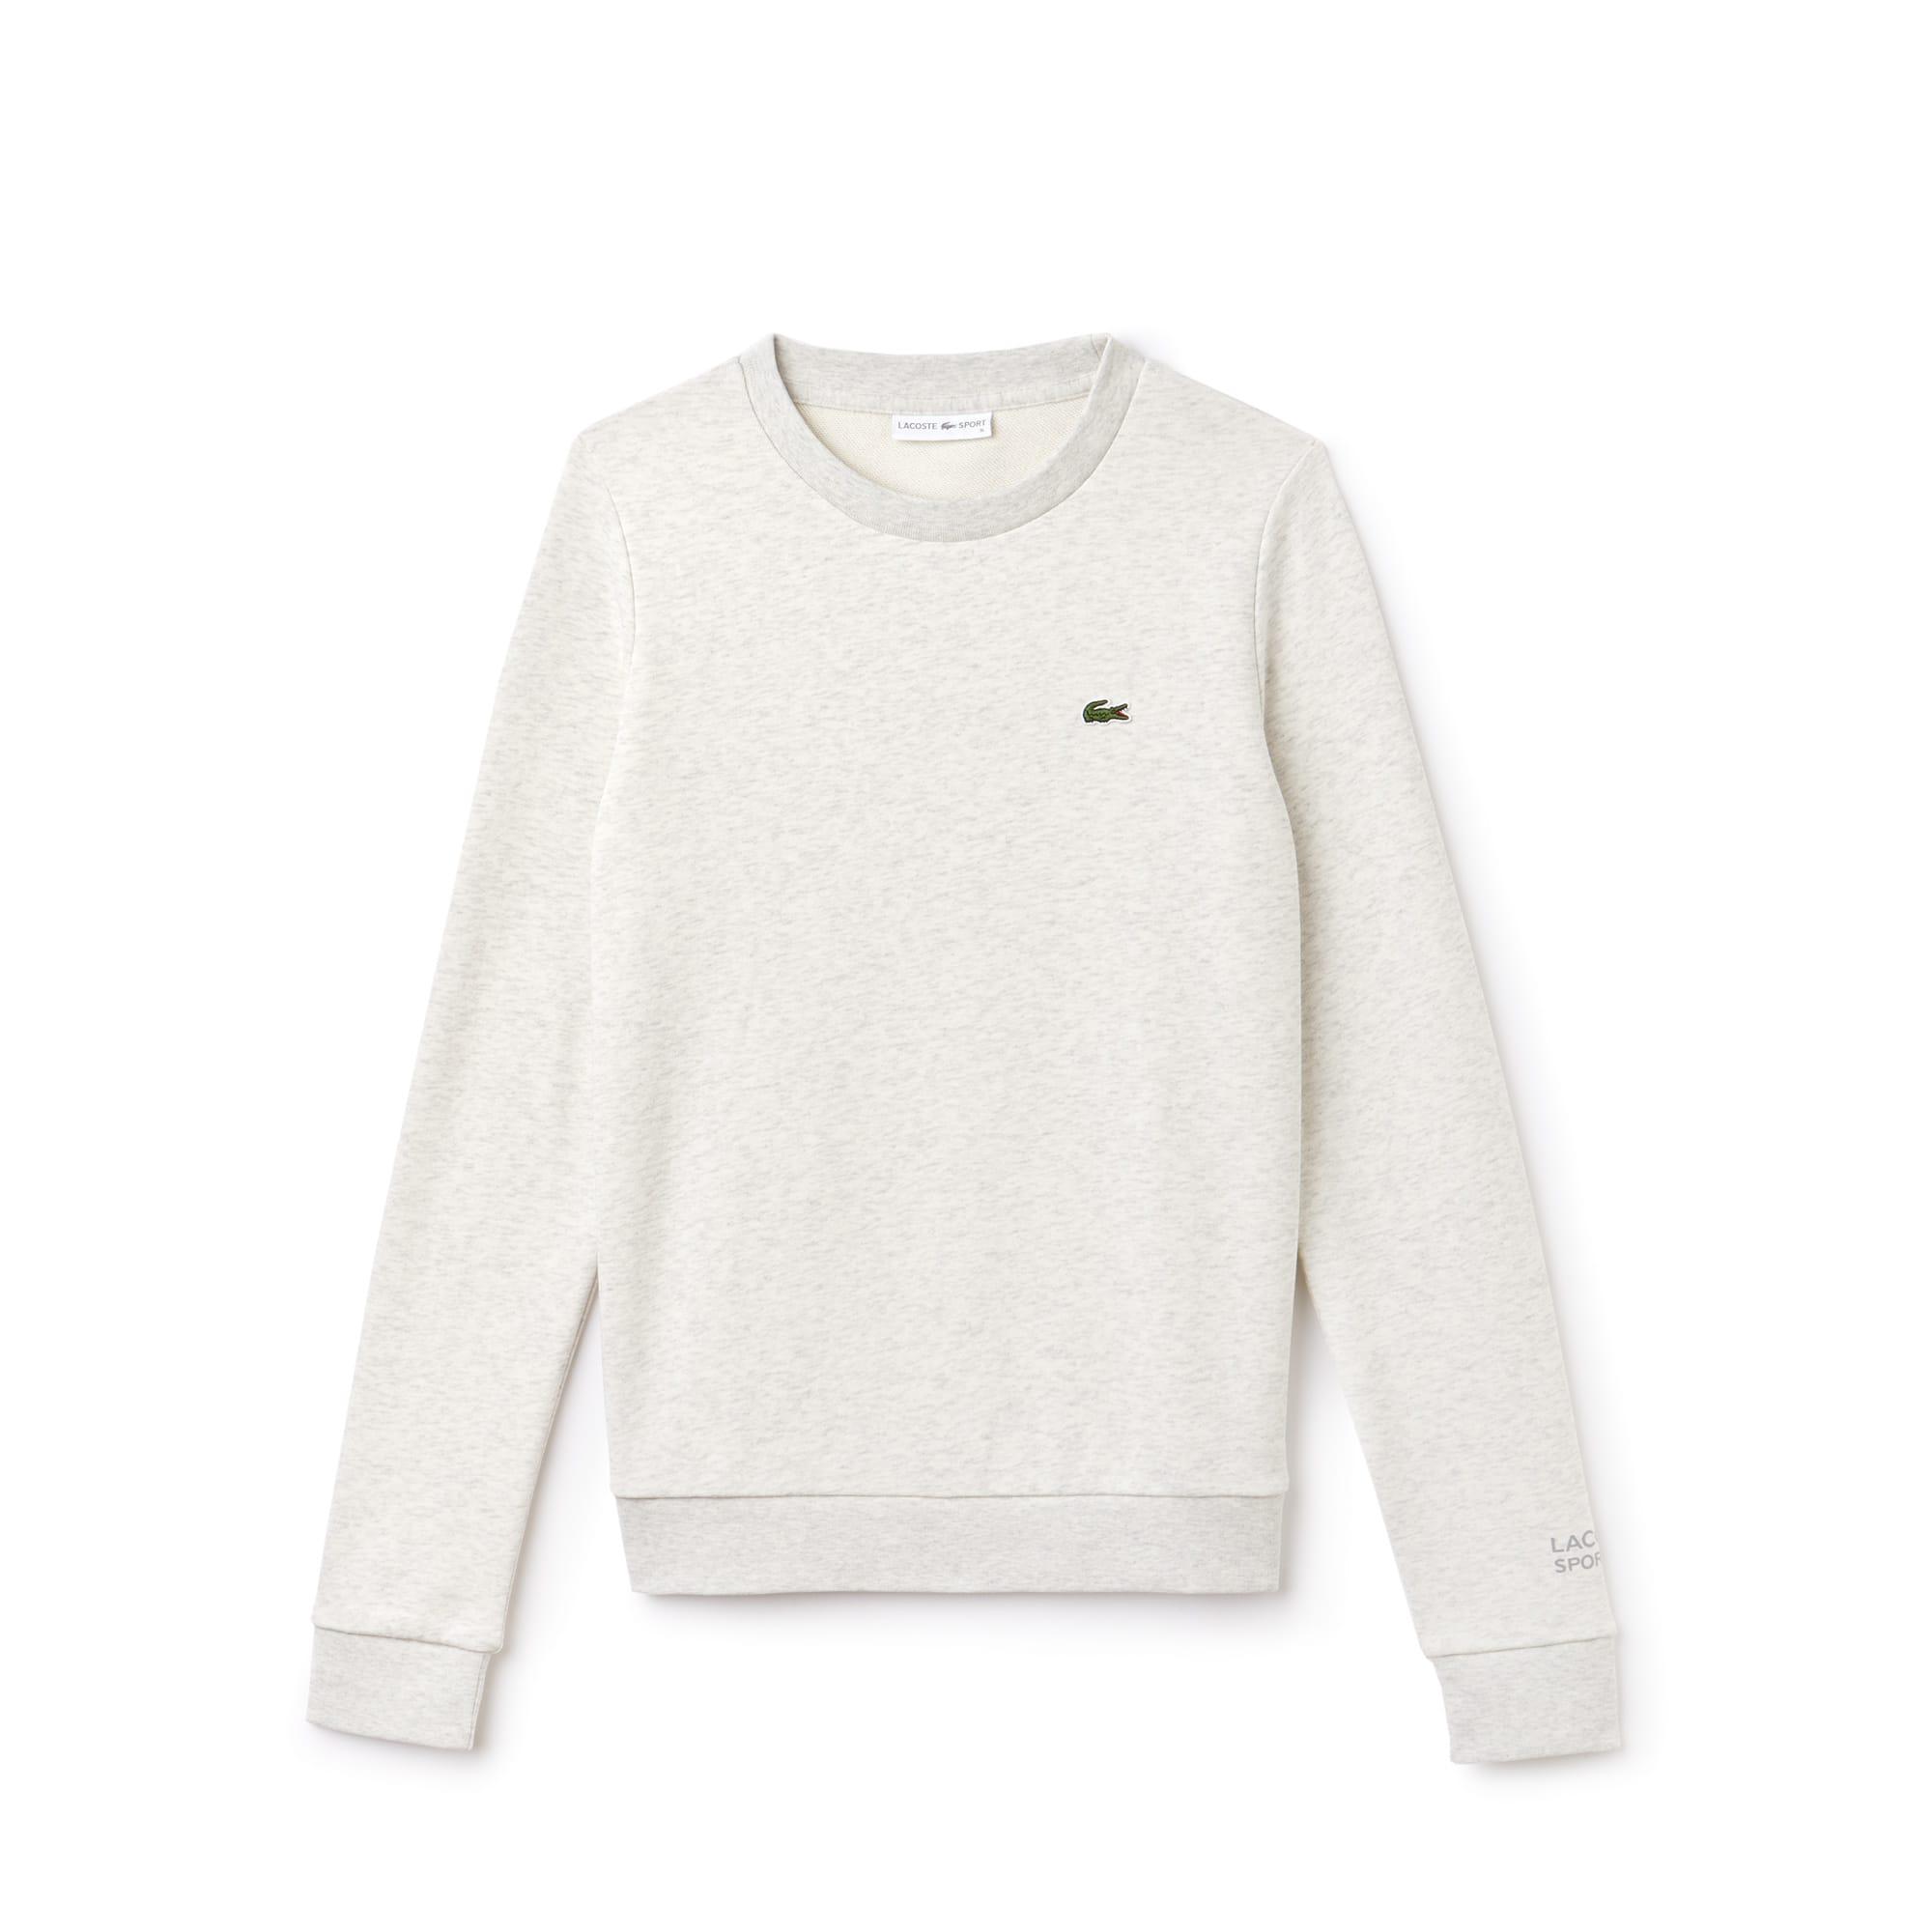 3c43587018 Women's Lacoste SPORT Tennis Cotton Fleece Sweatshirt ...